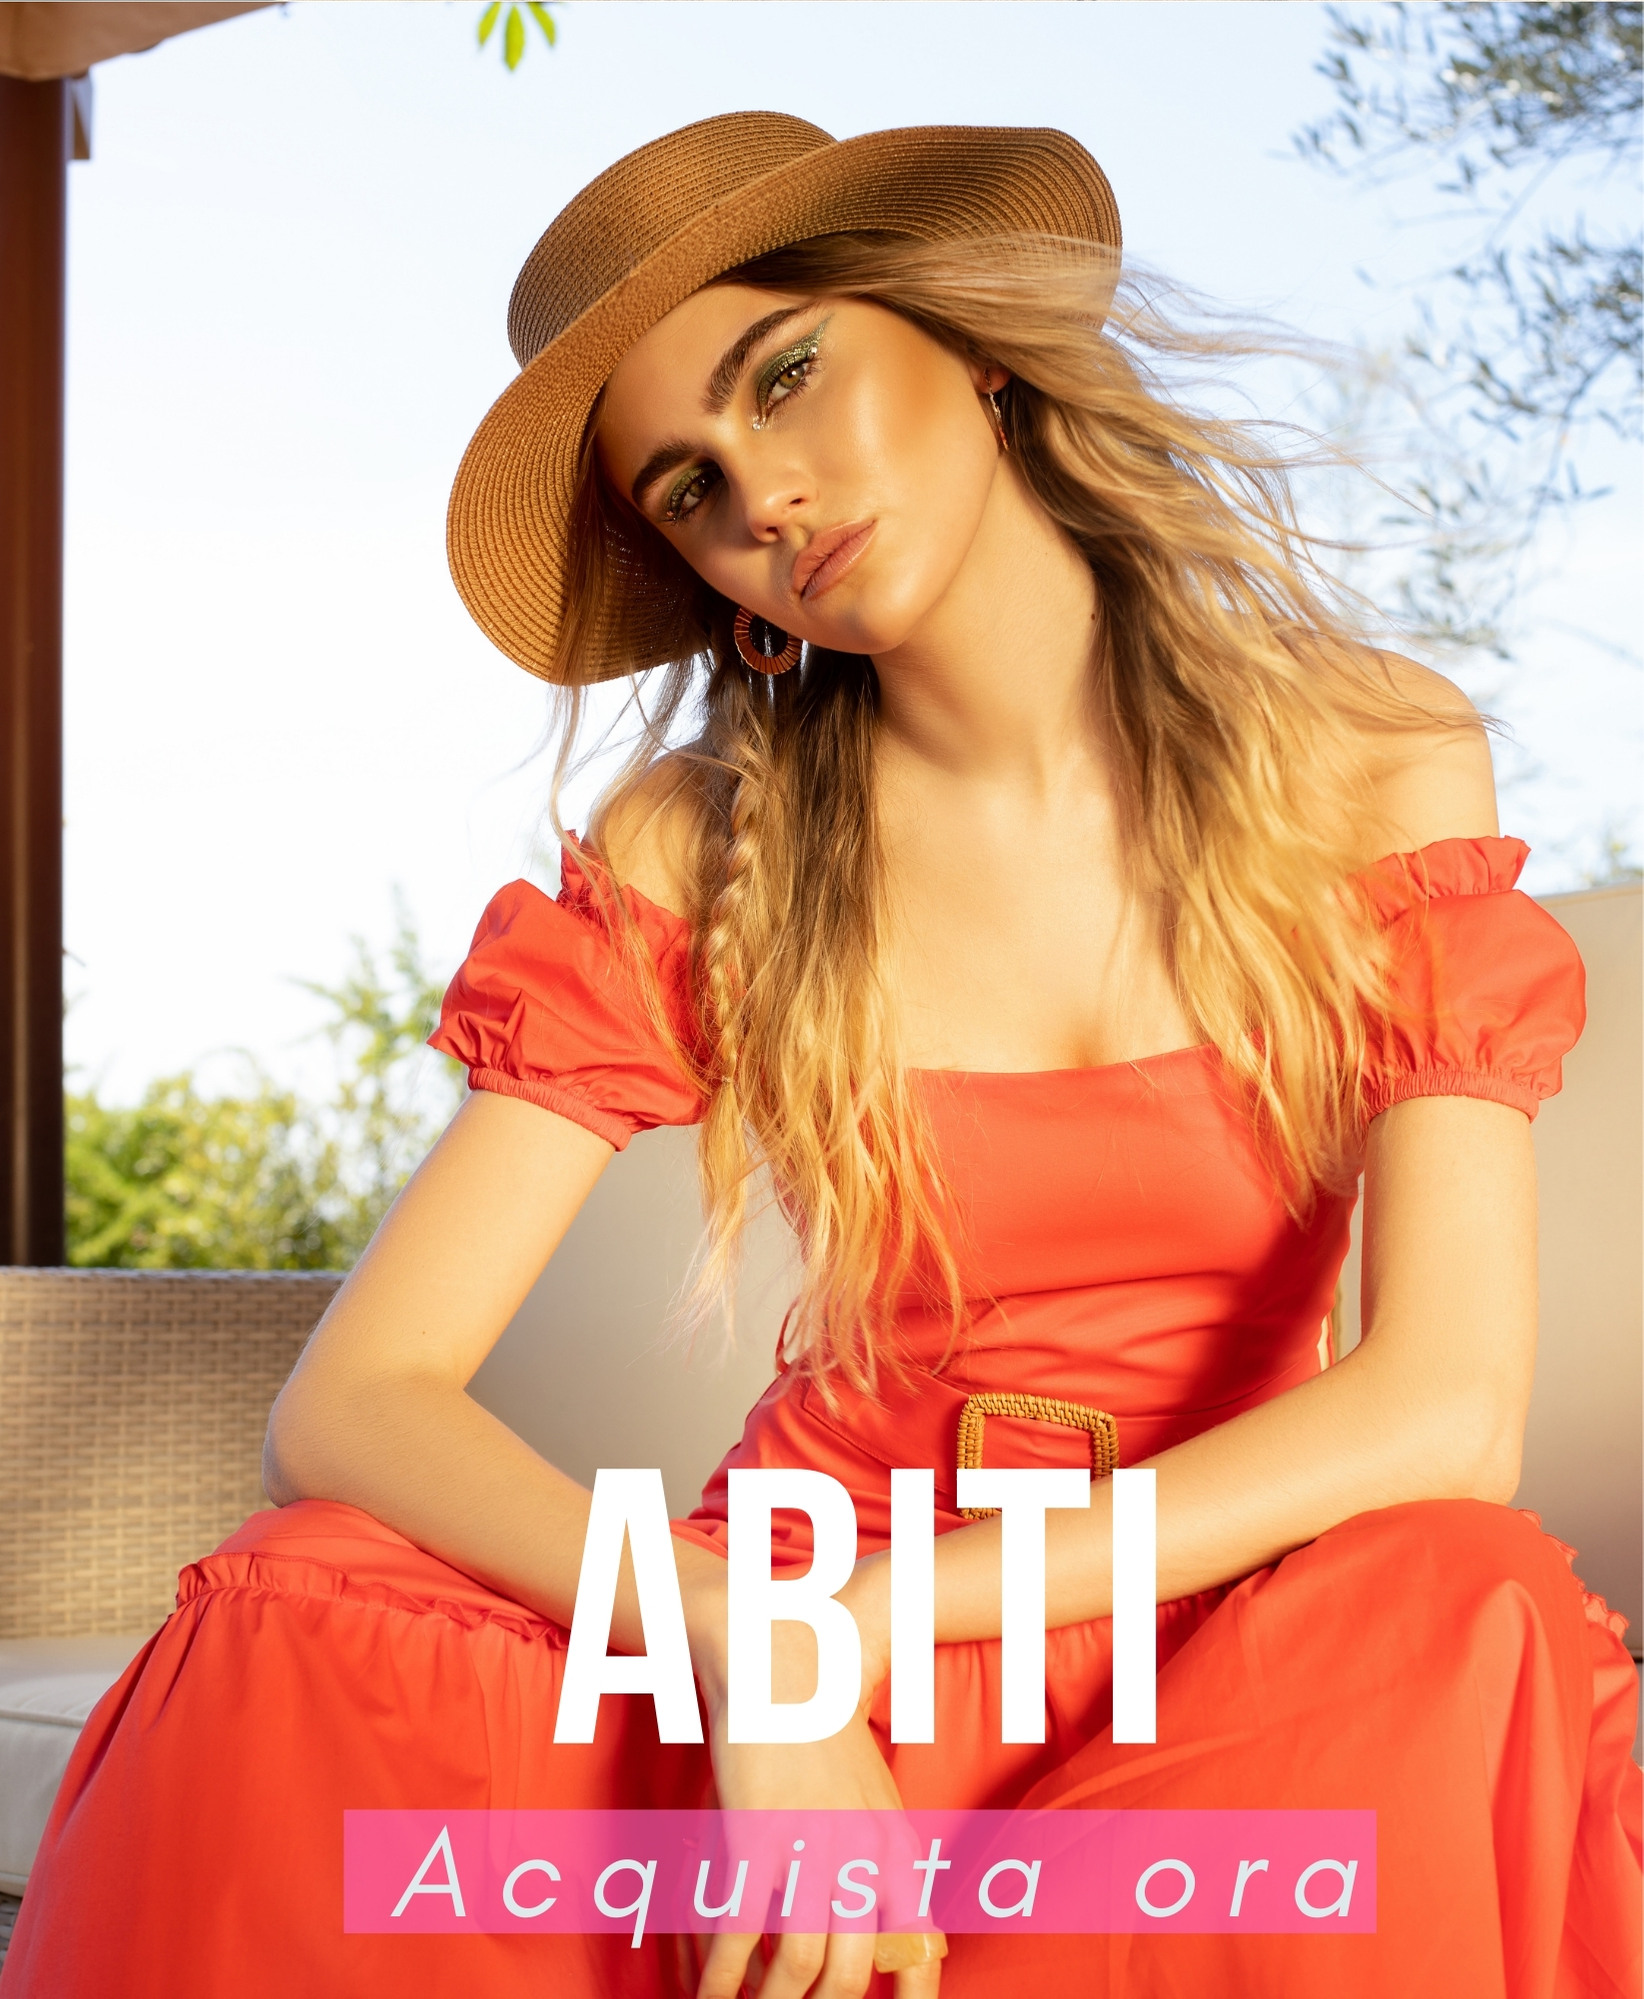 Abiti | Summer Collection 21